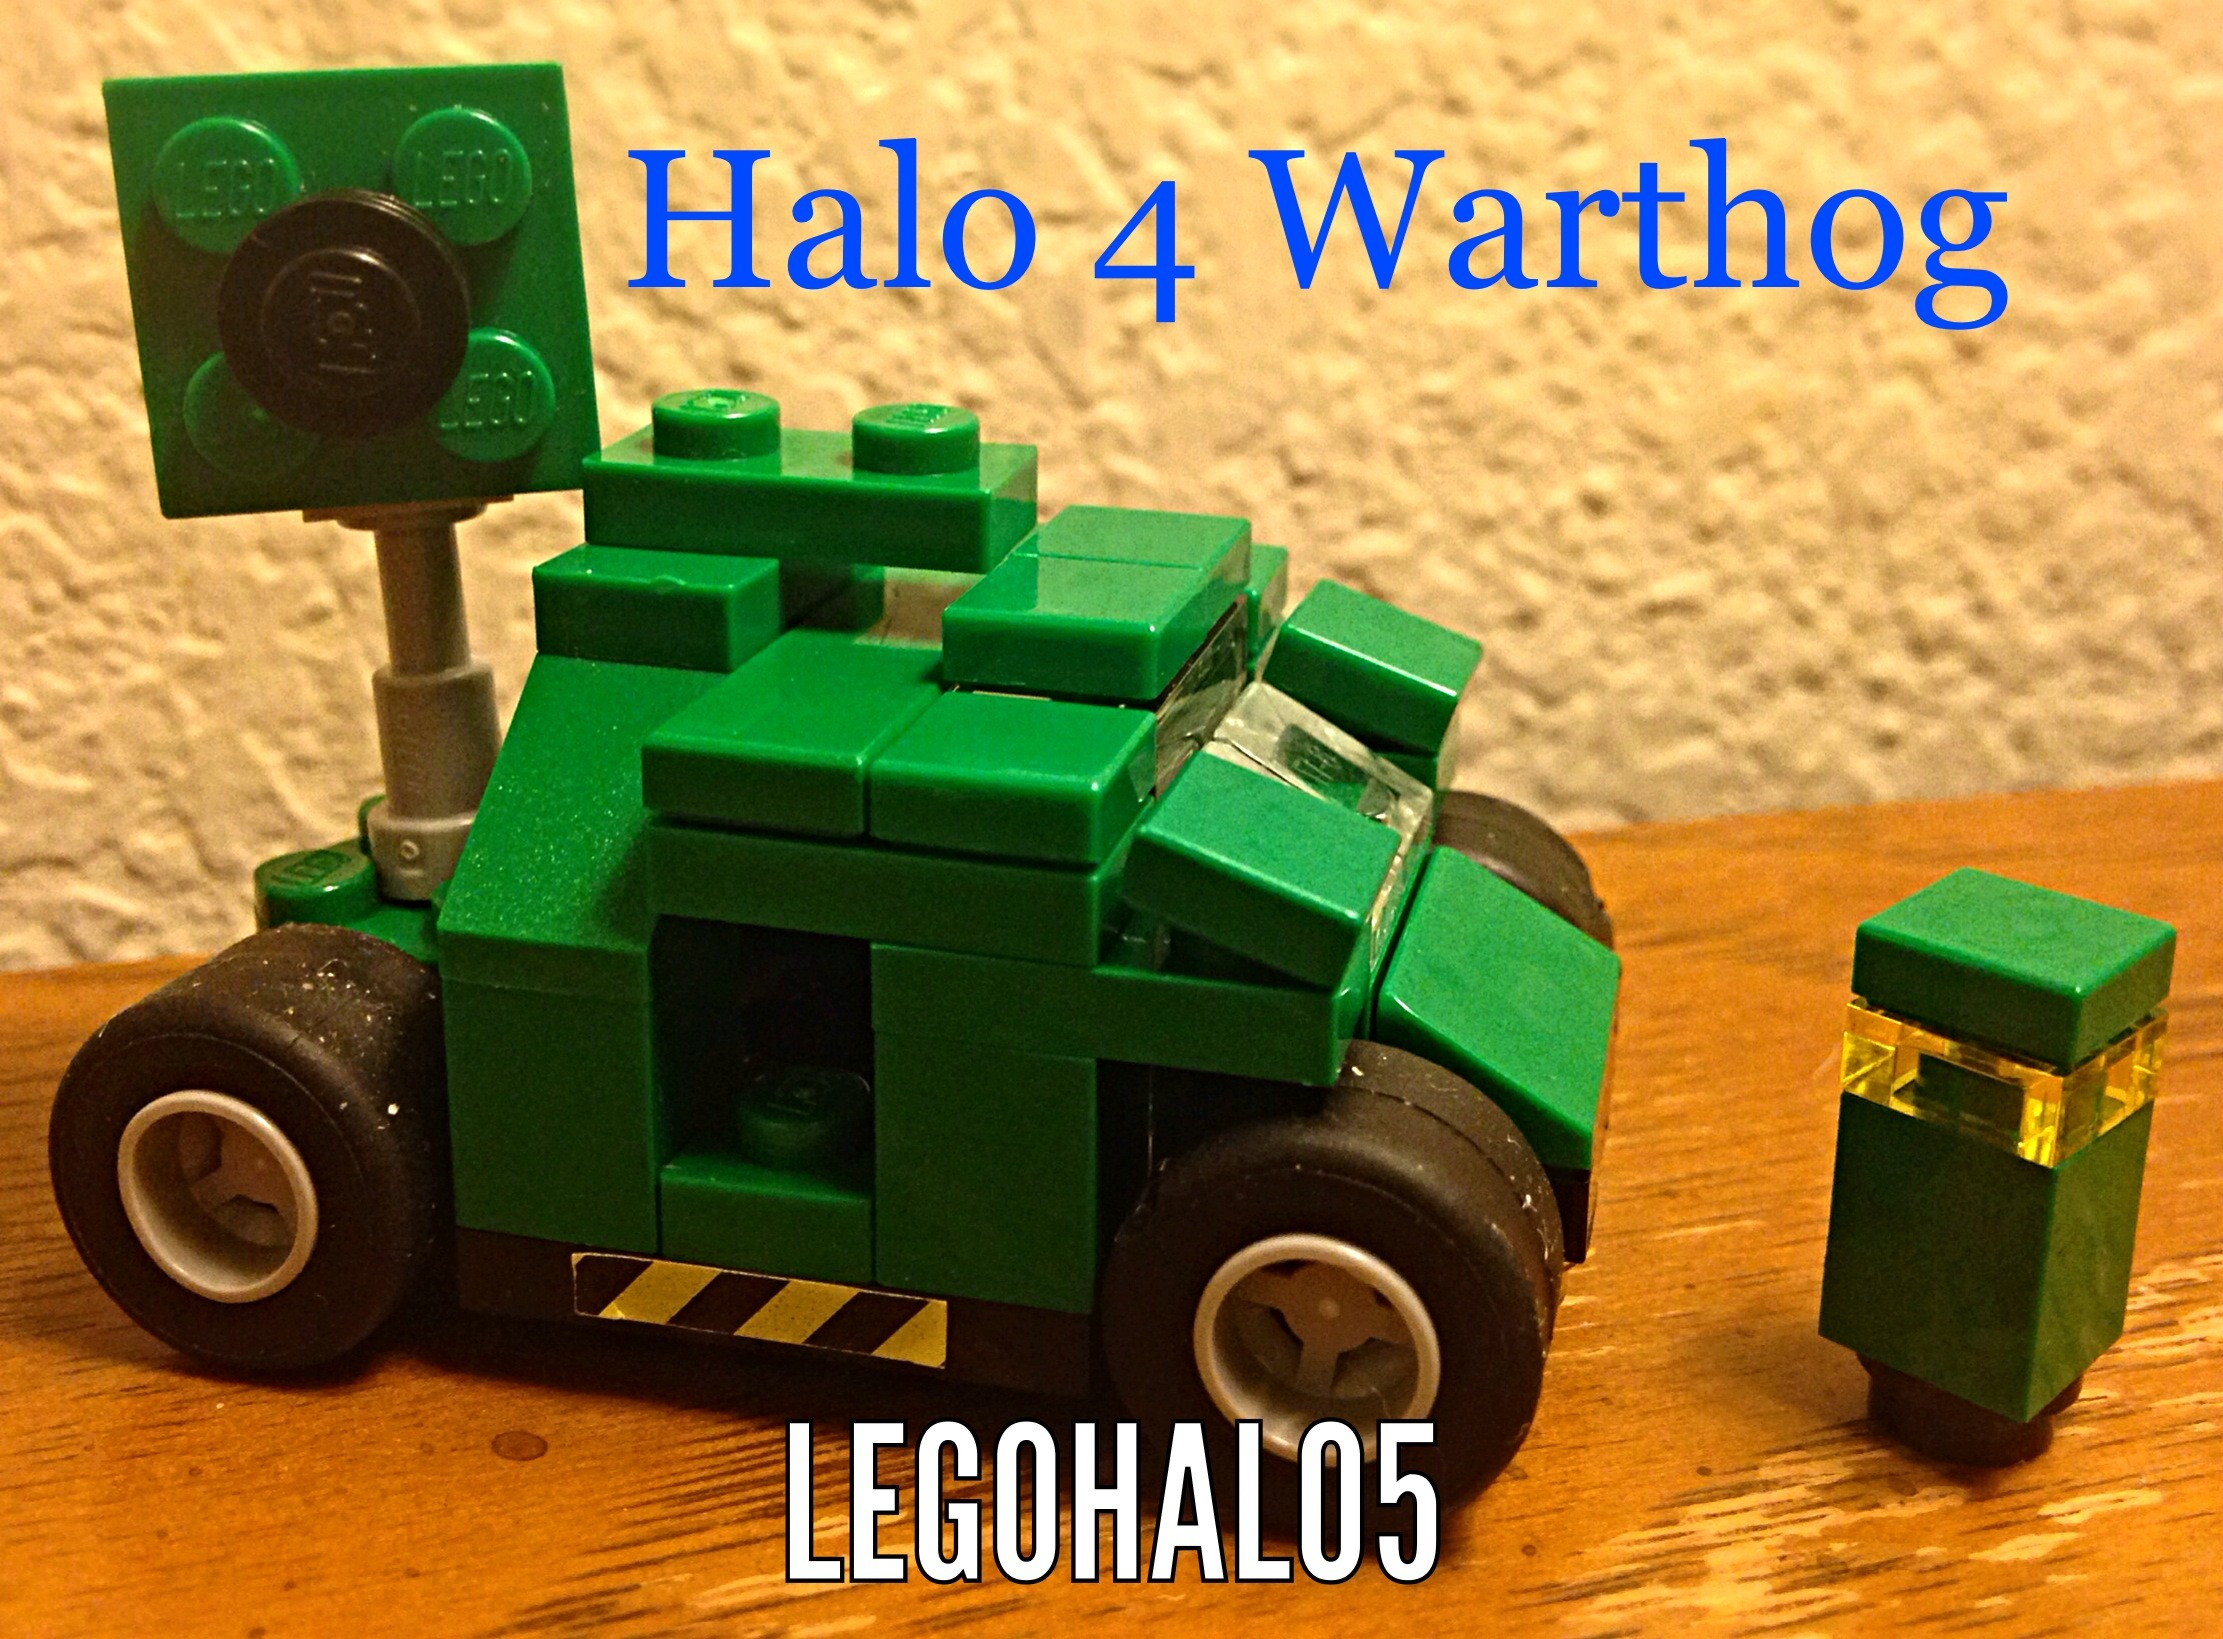 Lego Halo Warthog!